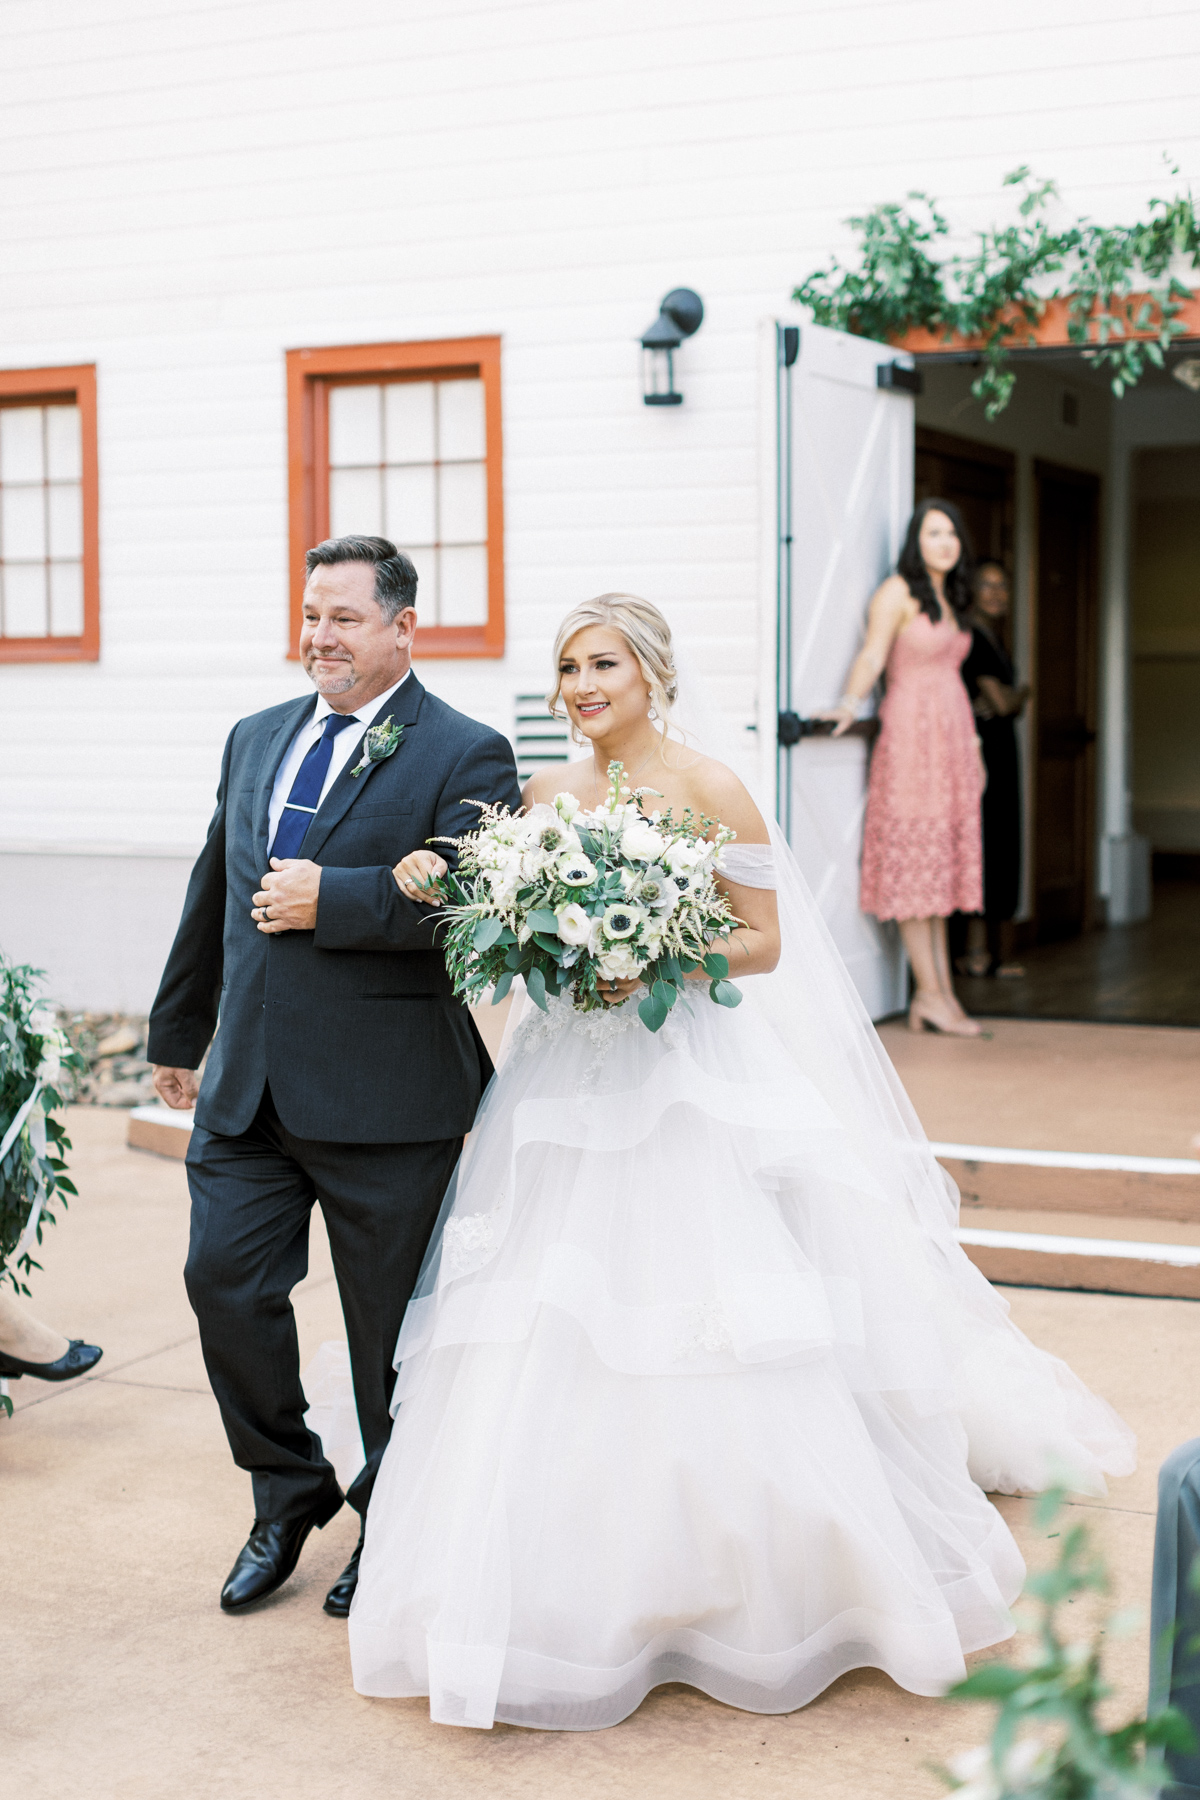 winmock-kinderton-wedding-035.jpg